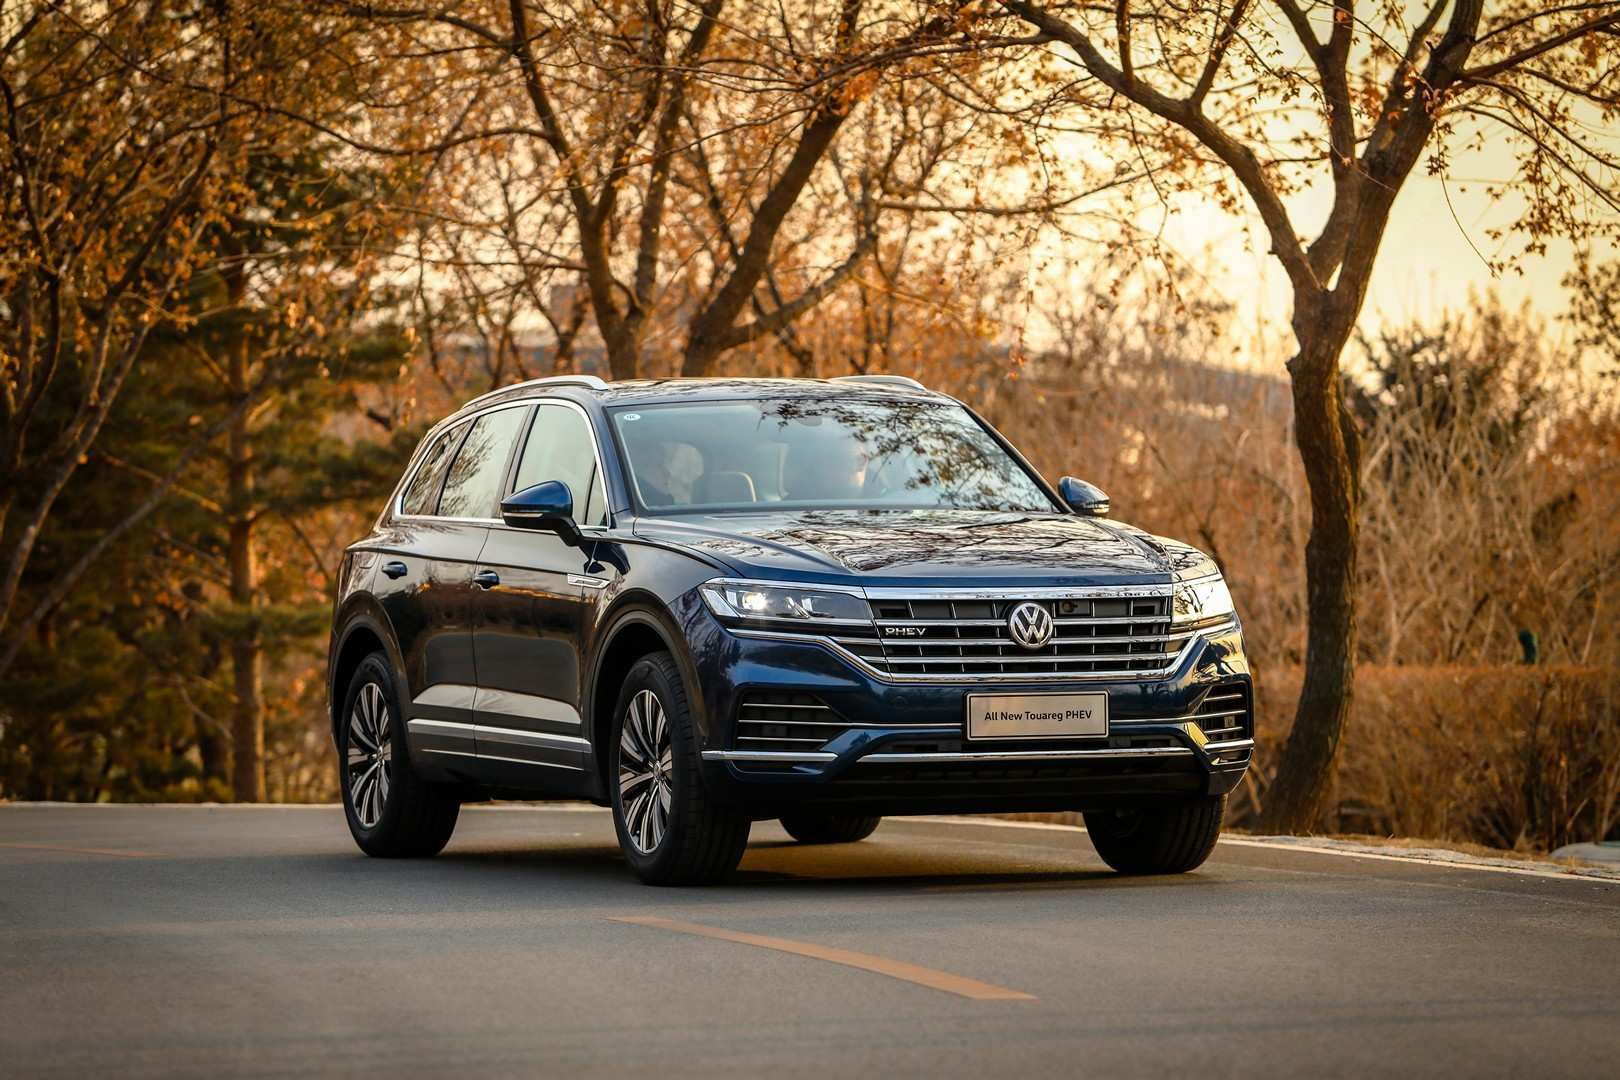 74 Concept of Volkswagen Touareg Hybrid 2020 Rumors by Volkswagen Touareg Hybrid 2020